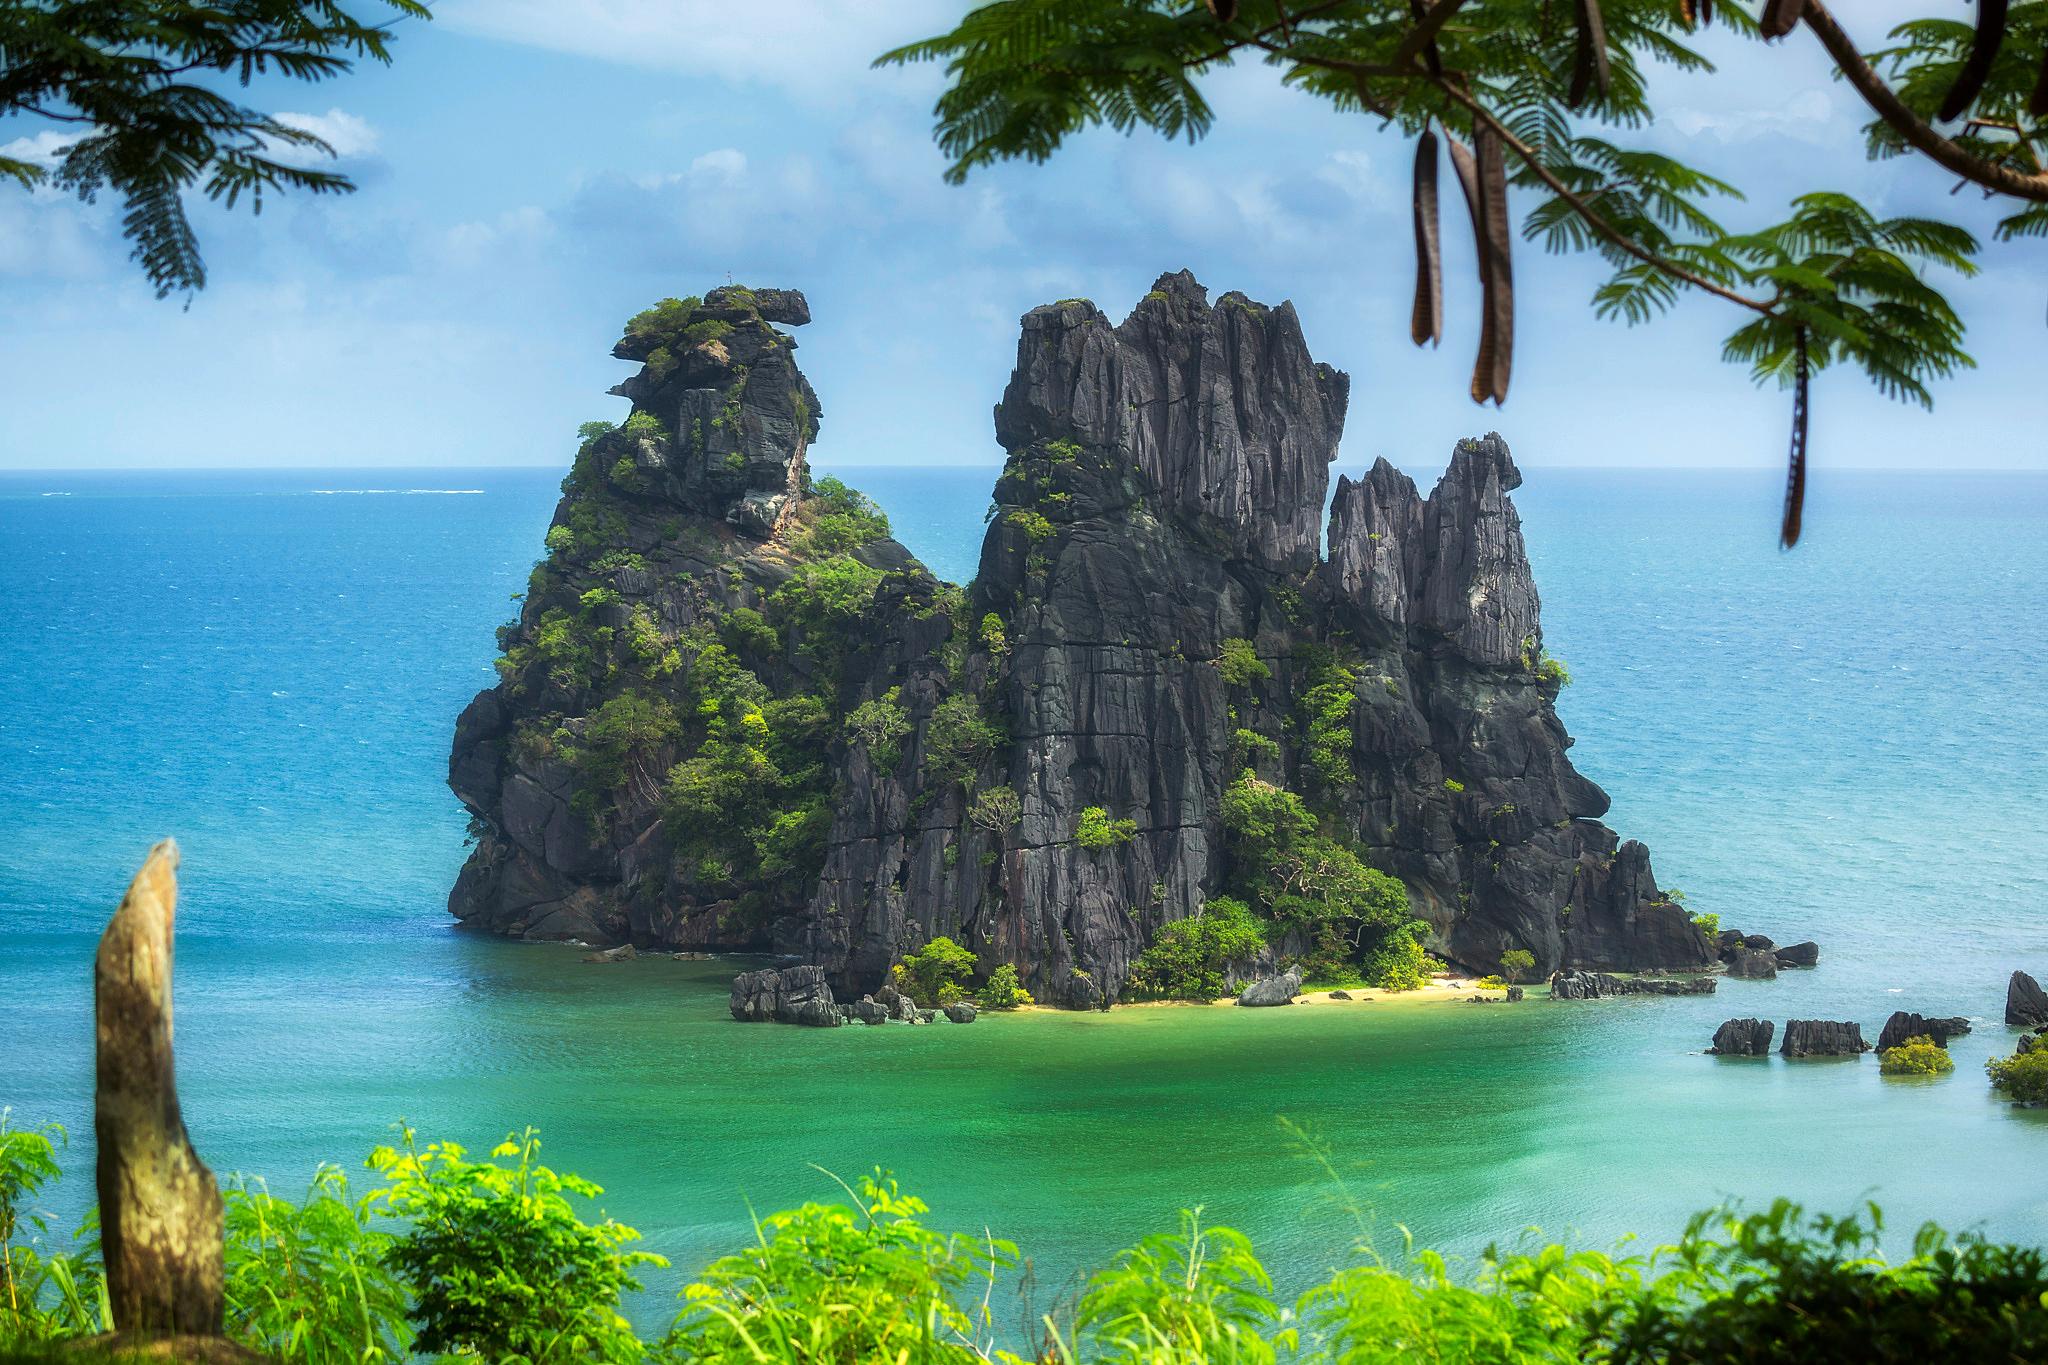 Ocean Rock in New Caledonia Pacific Ocean HD Wallpaper 2048x1365